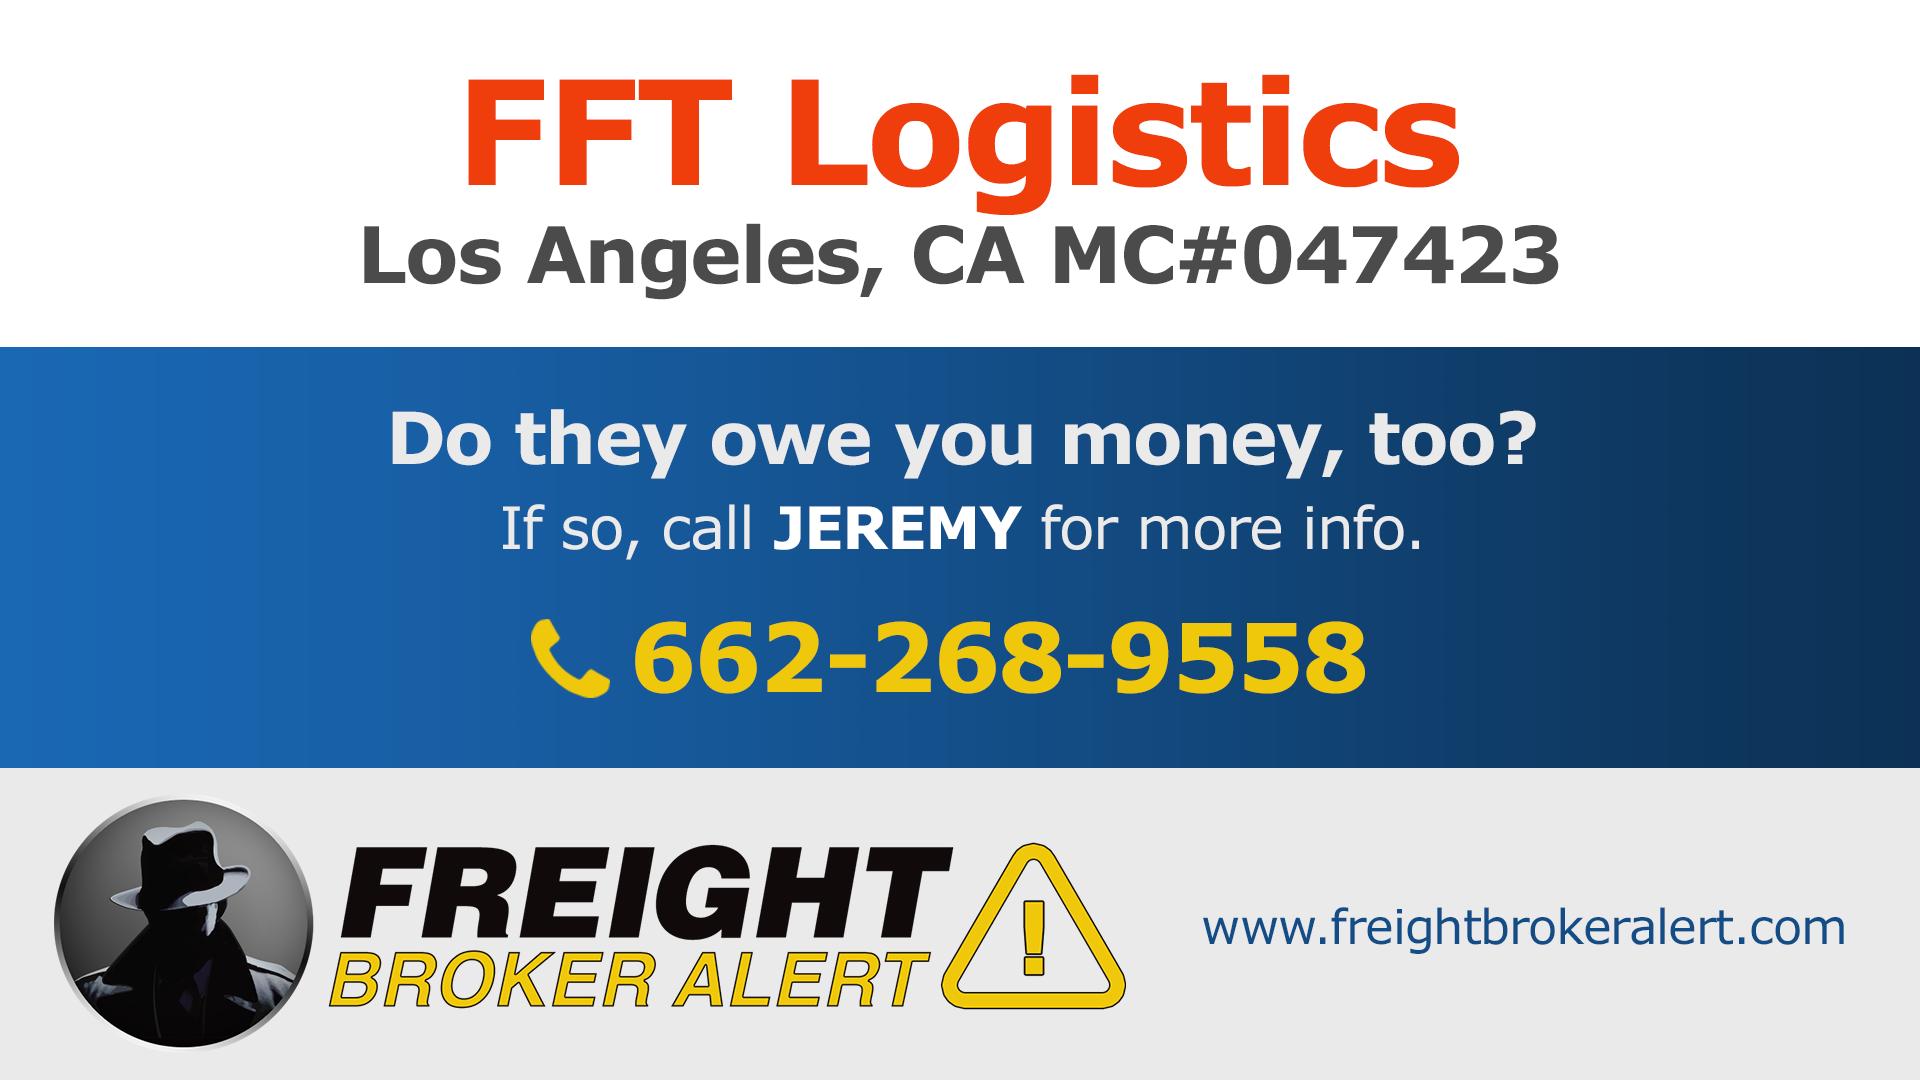 FFT Logistics California